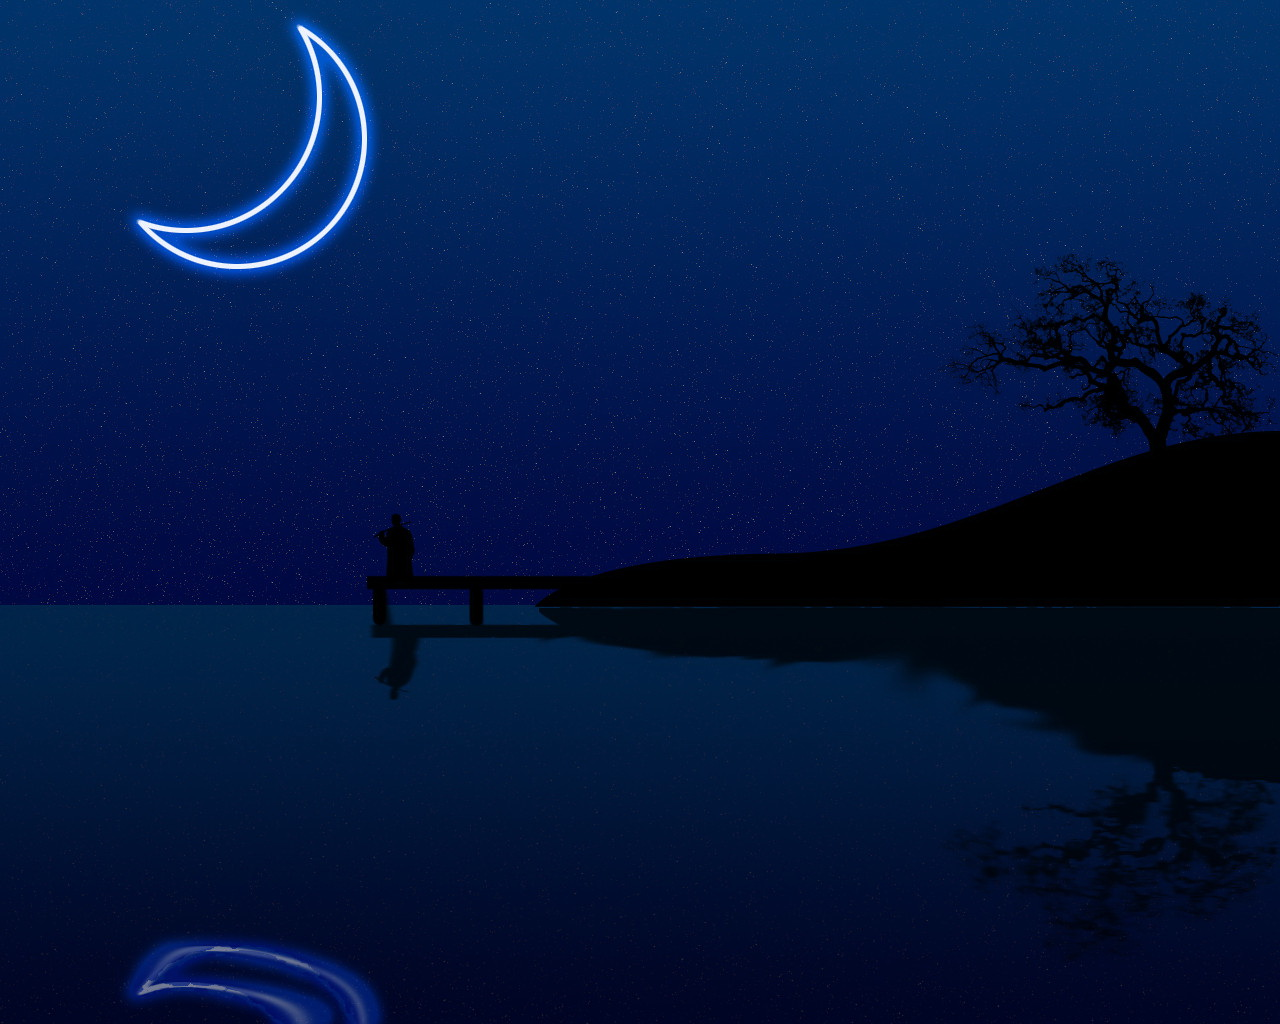 Wonderful Wallpaper Night Cartoon - night-moon  Collection.jpg